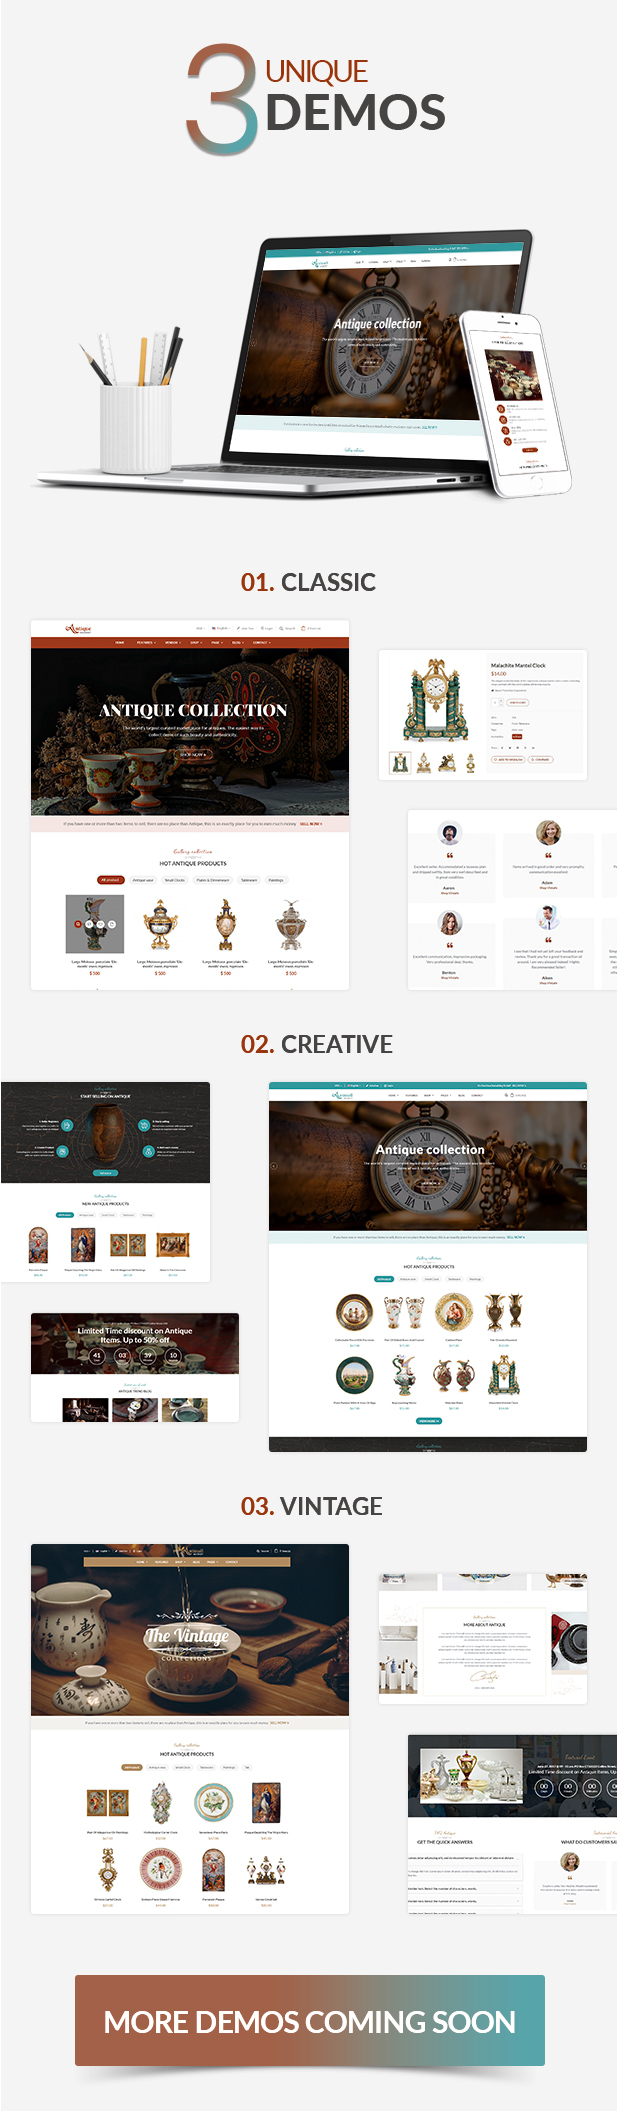 AntiqueMall - Antique Store Marketplace WordPress Theme - 9